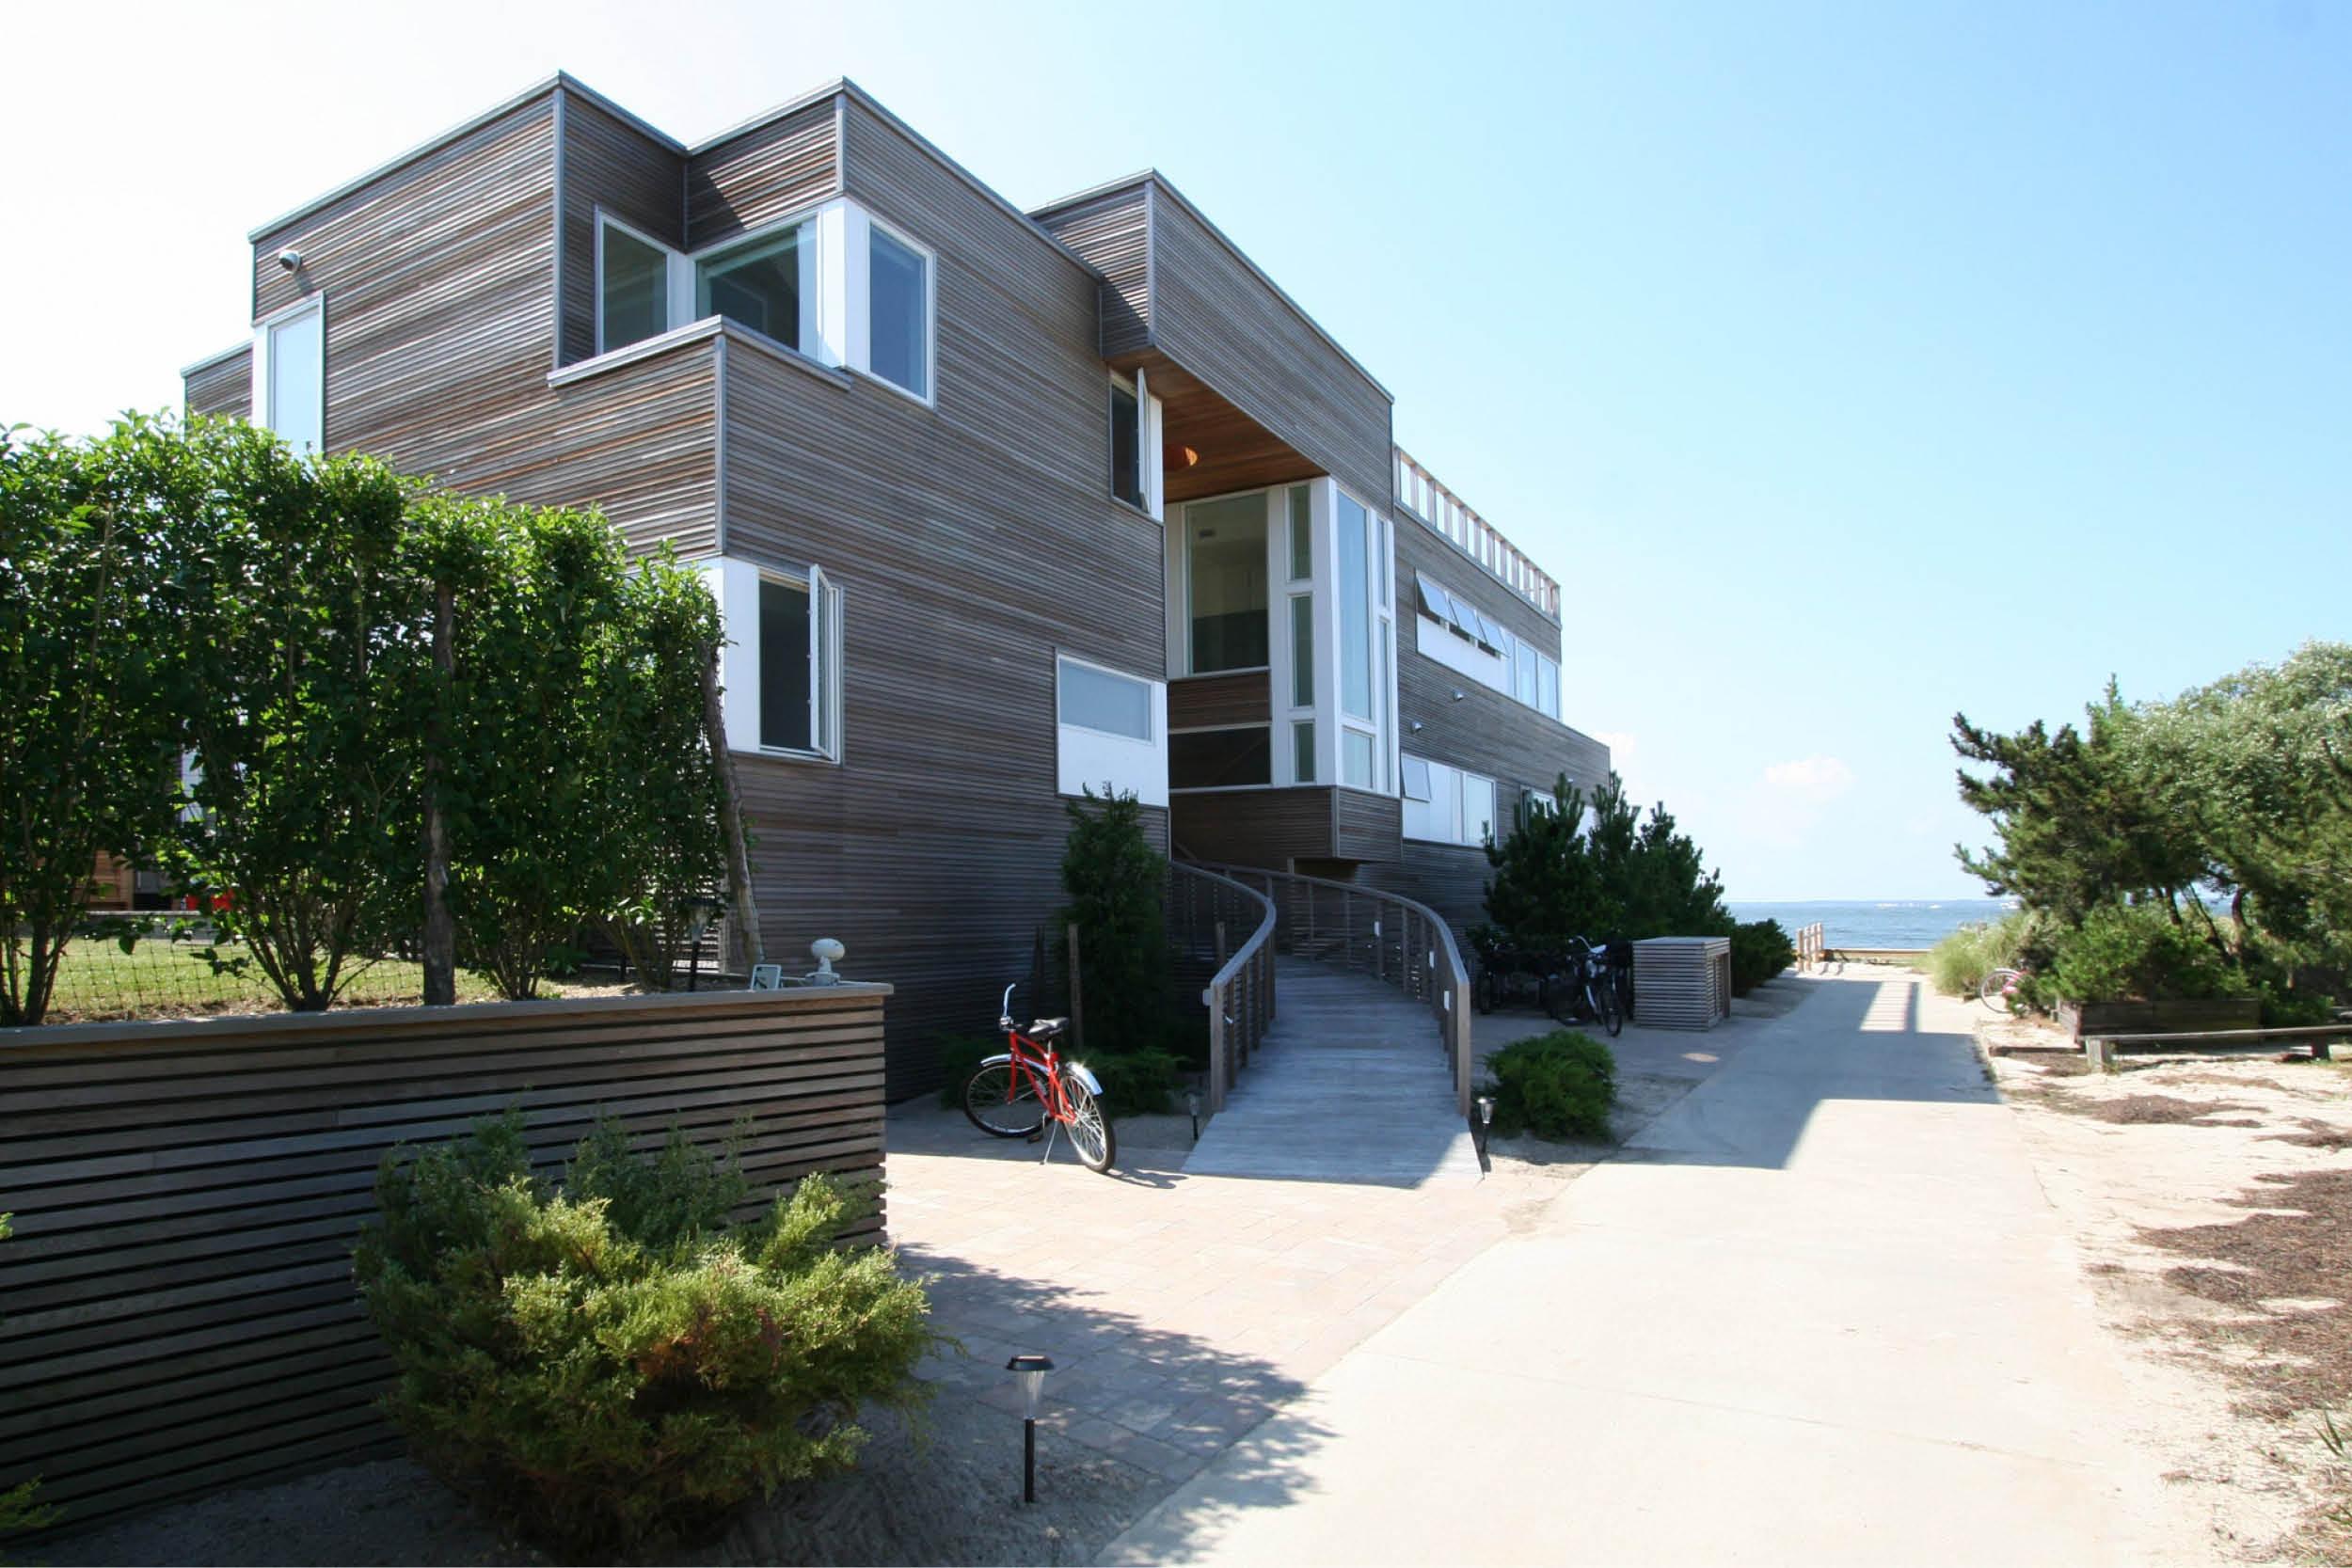 Modern Modular Prefab House | Cedar siding Beach White Windows | Fire Island New York | RES4